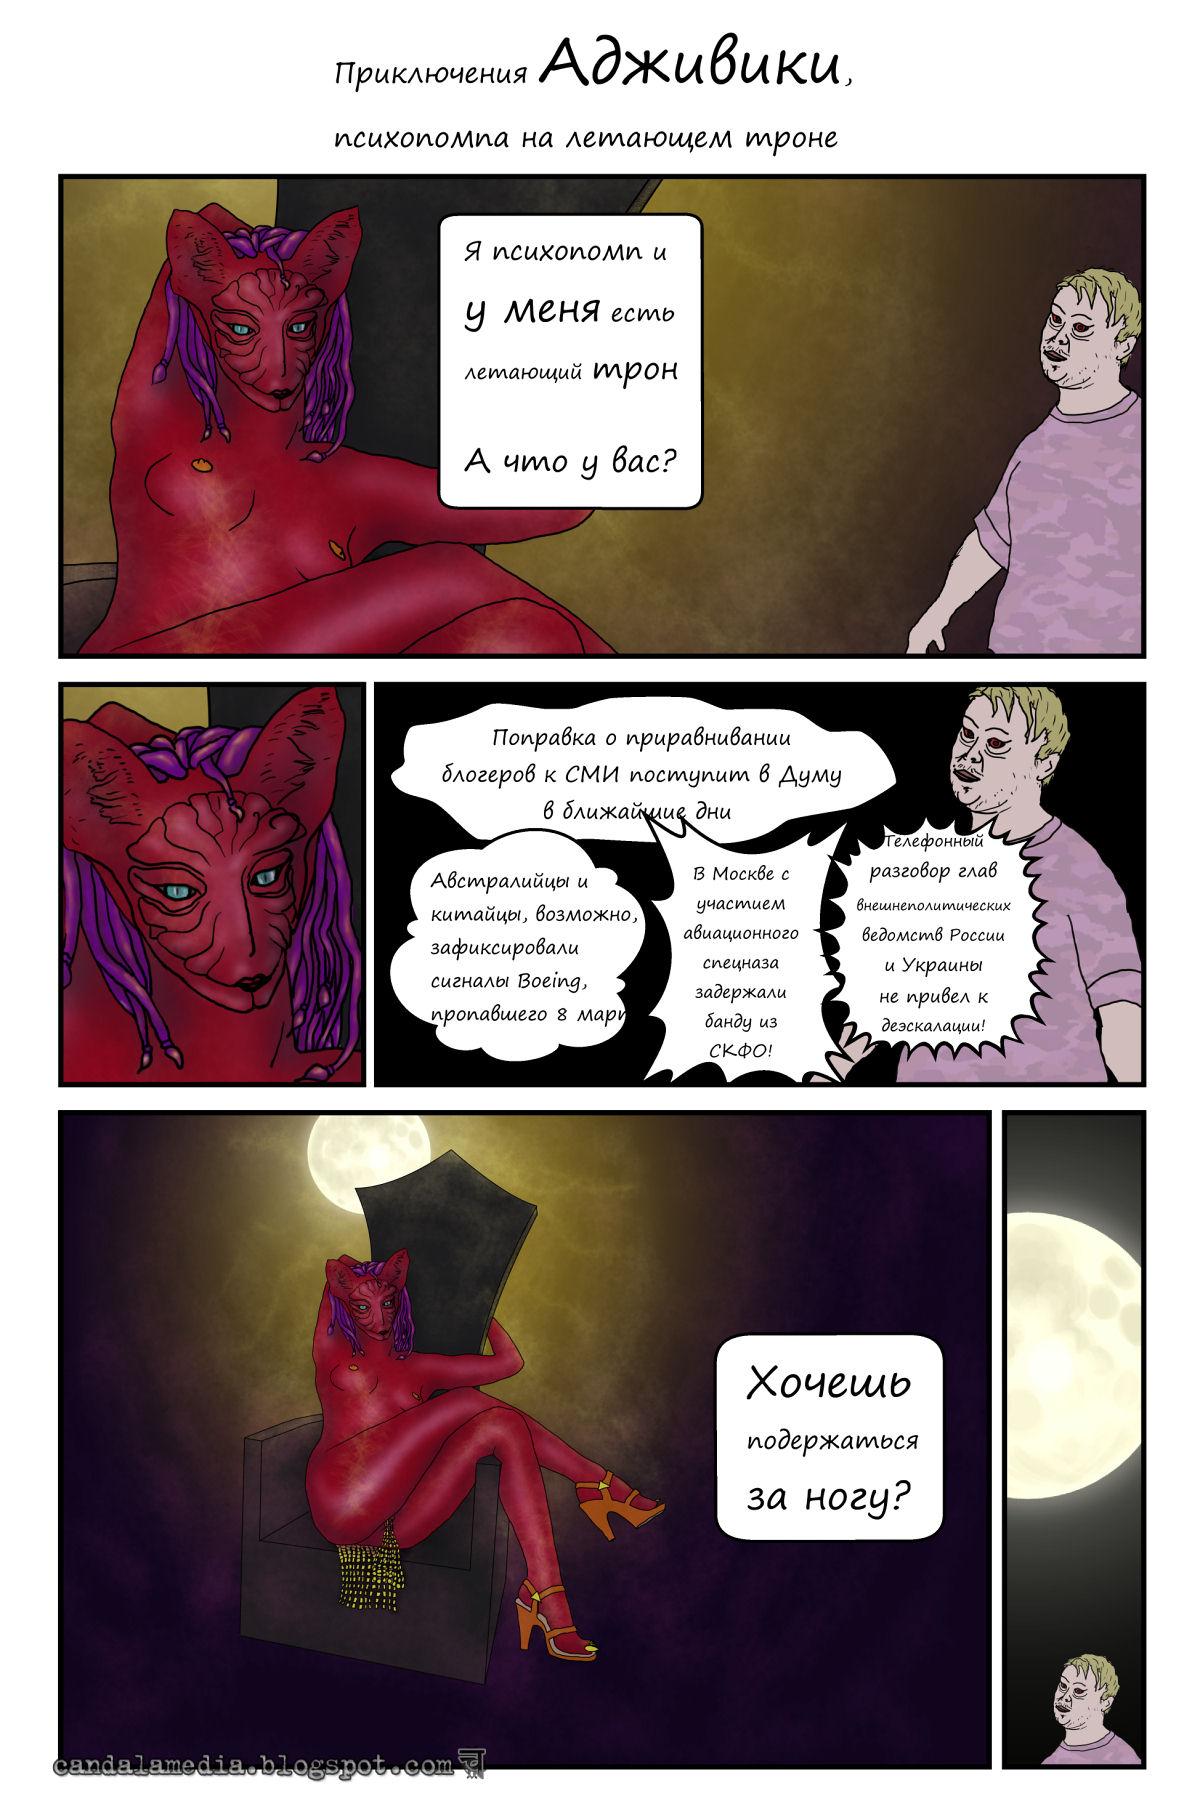 Приключения Адживики - манга